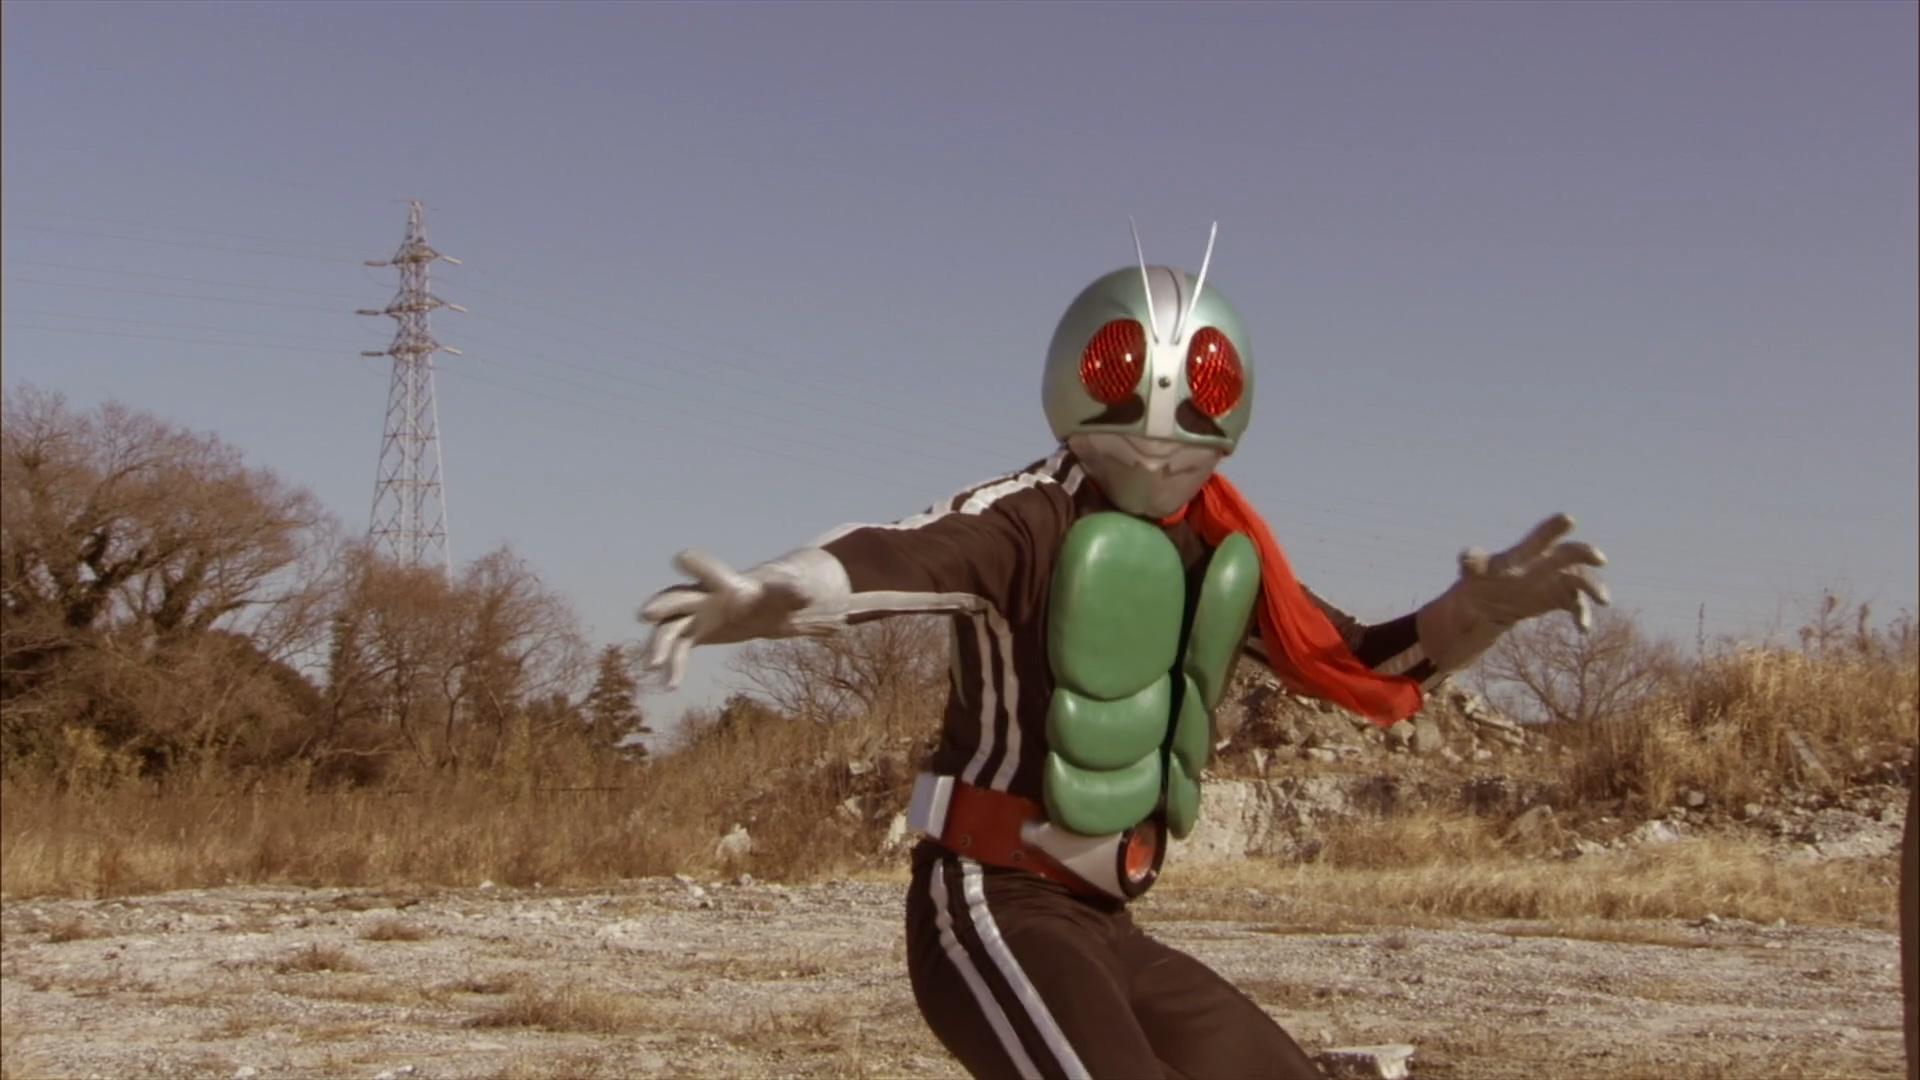 http://vignette4.wikia.nocookie.net/kamenrider/images/d/d8/Ichigo_(Let's_Go_Kamen_Riders).jpg/revision/latest?cb=20120613162818